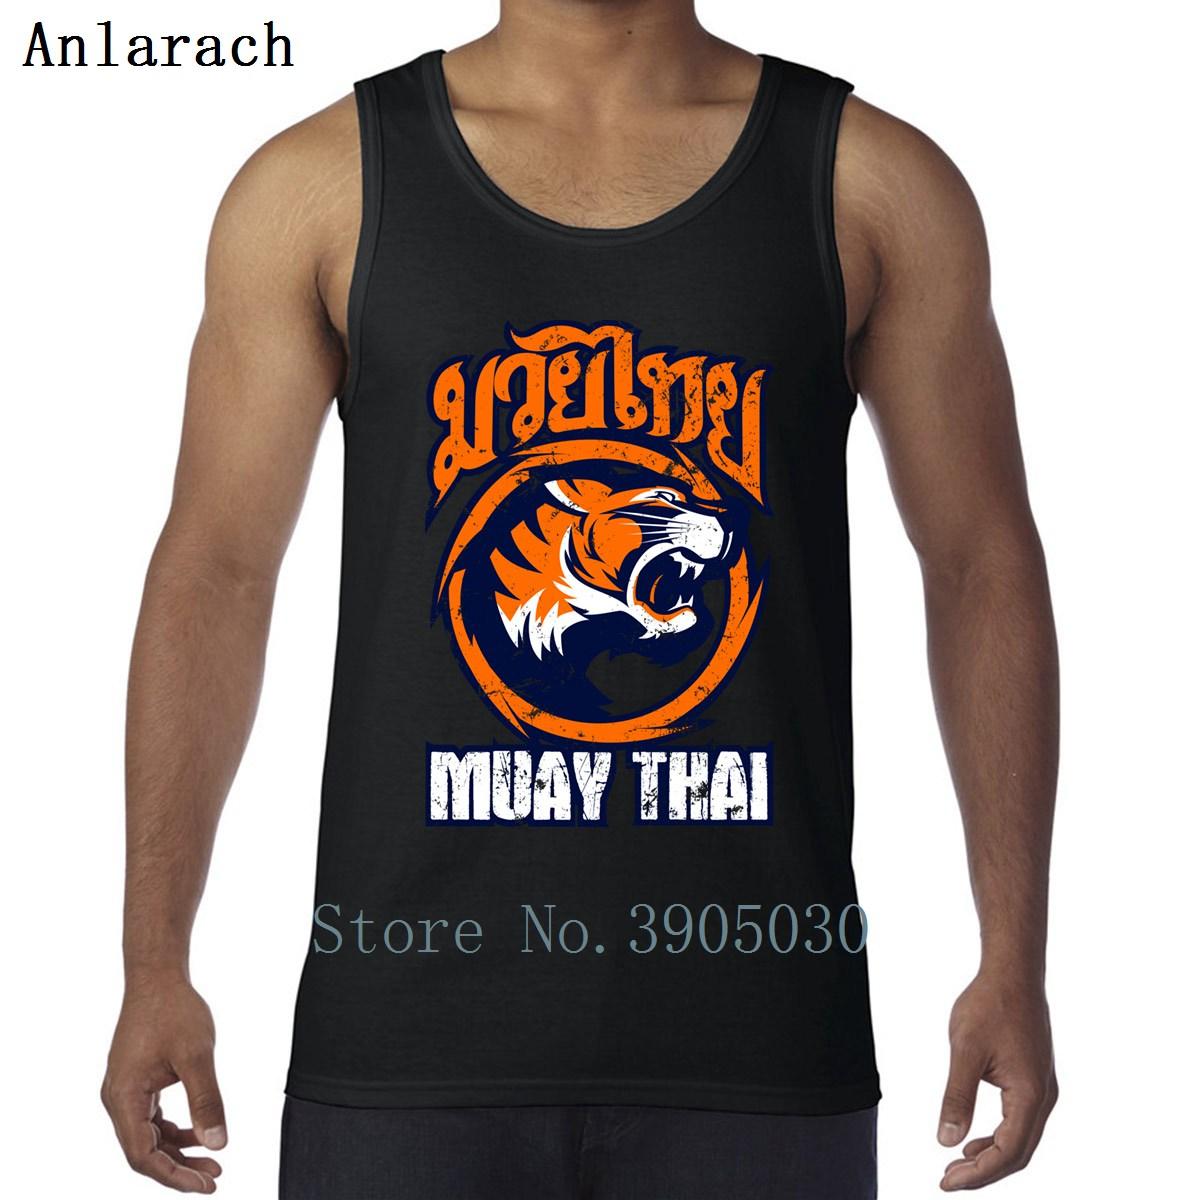 093e308a3019dd Buy muay thai america to thailand tiger vests jpg 1200x1200 Muay thai  thailand tank top